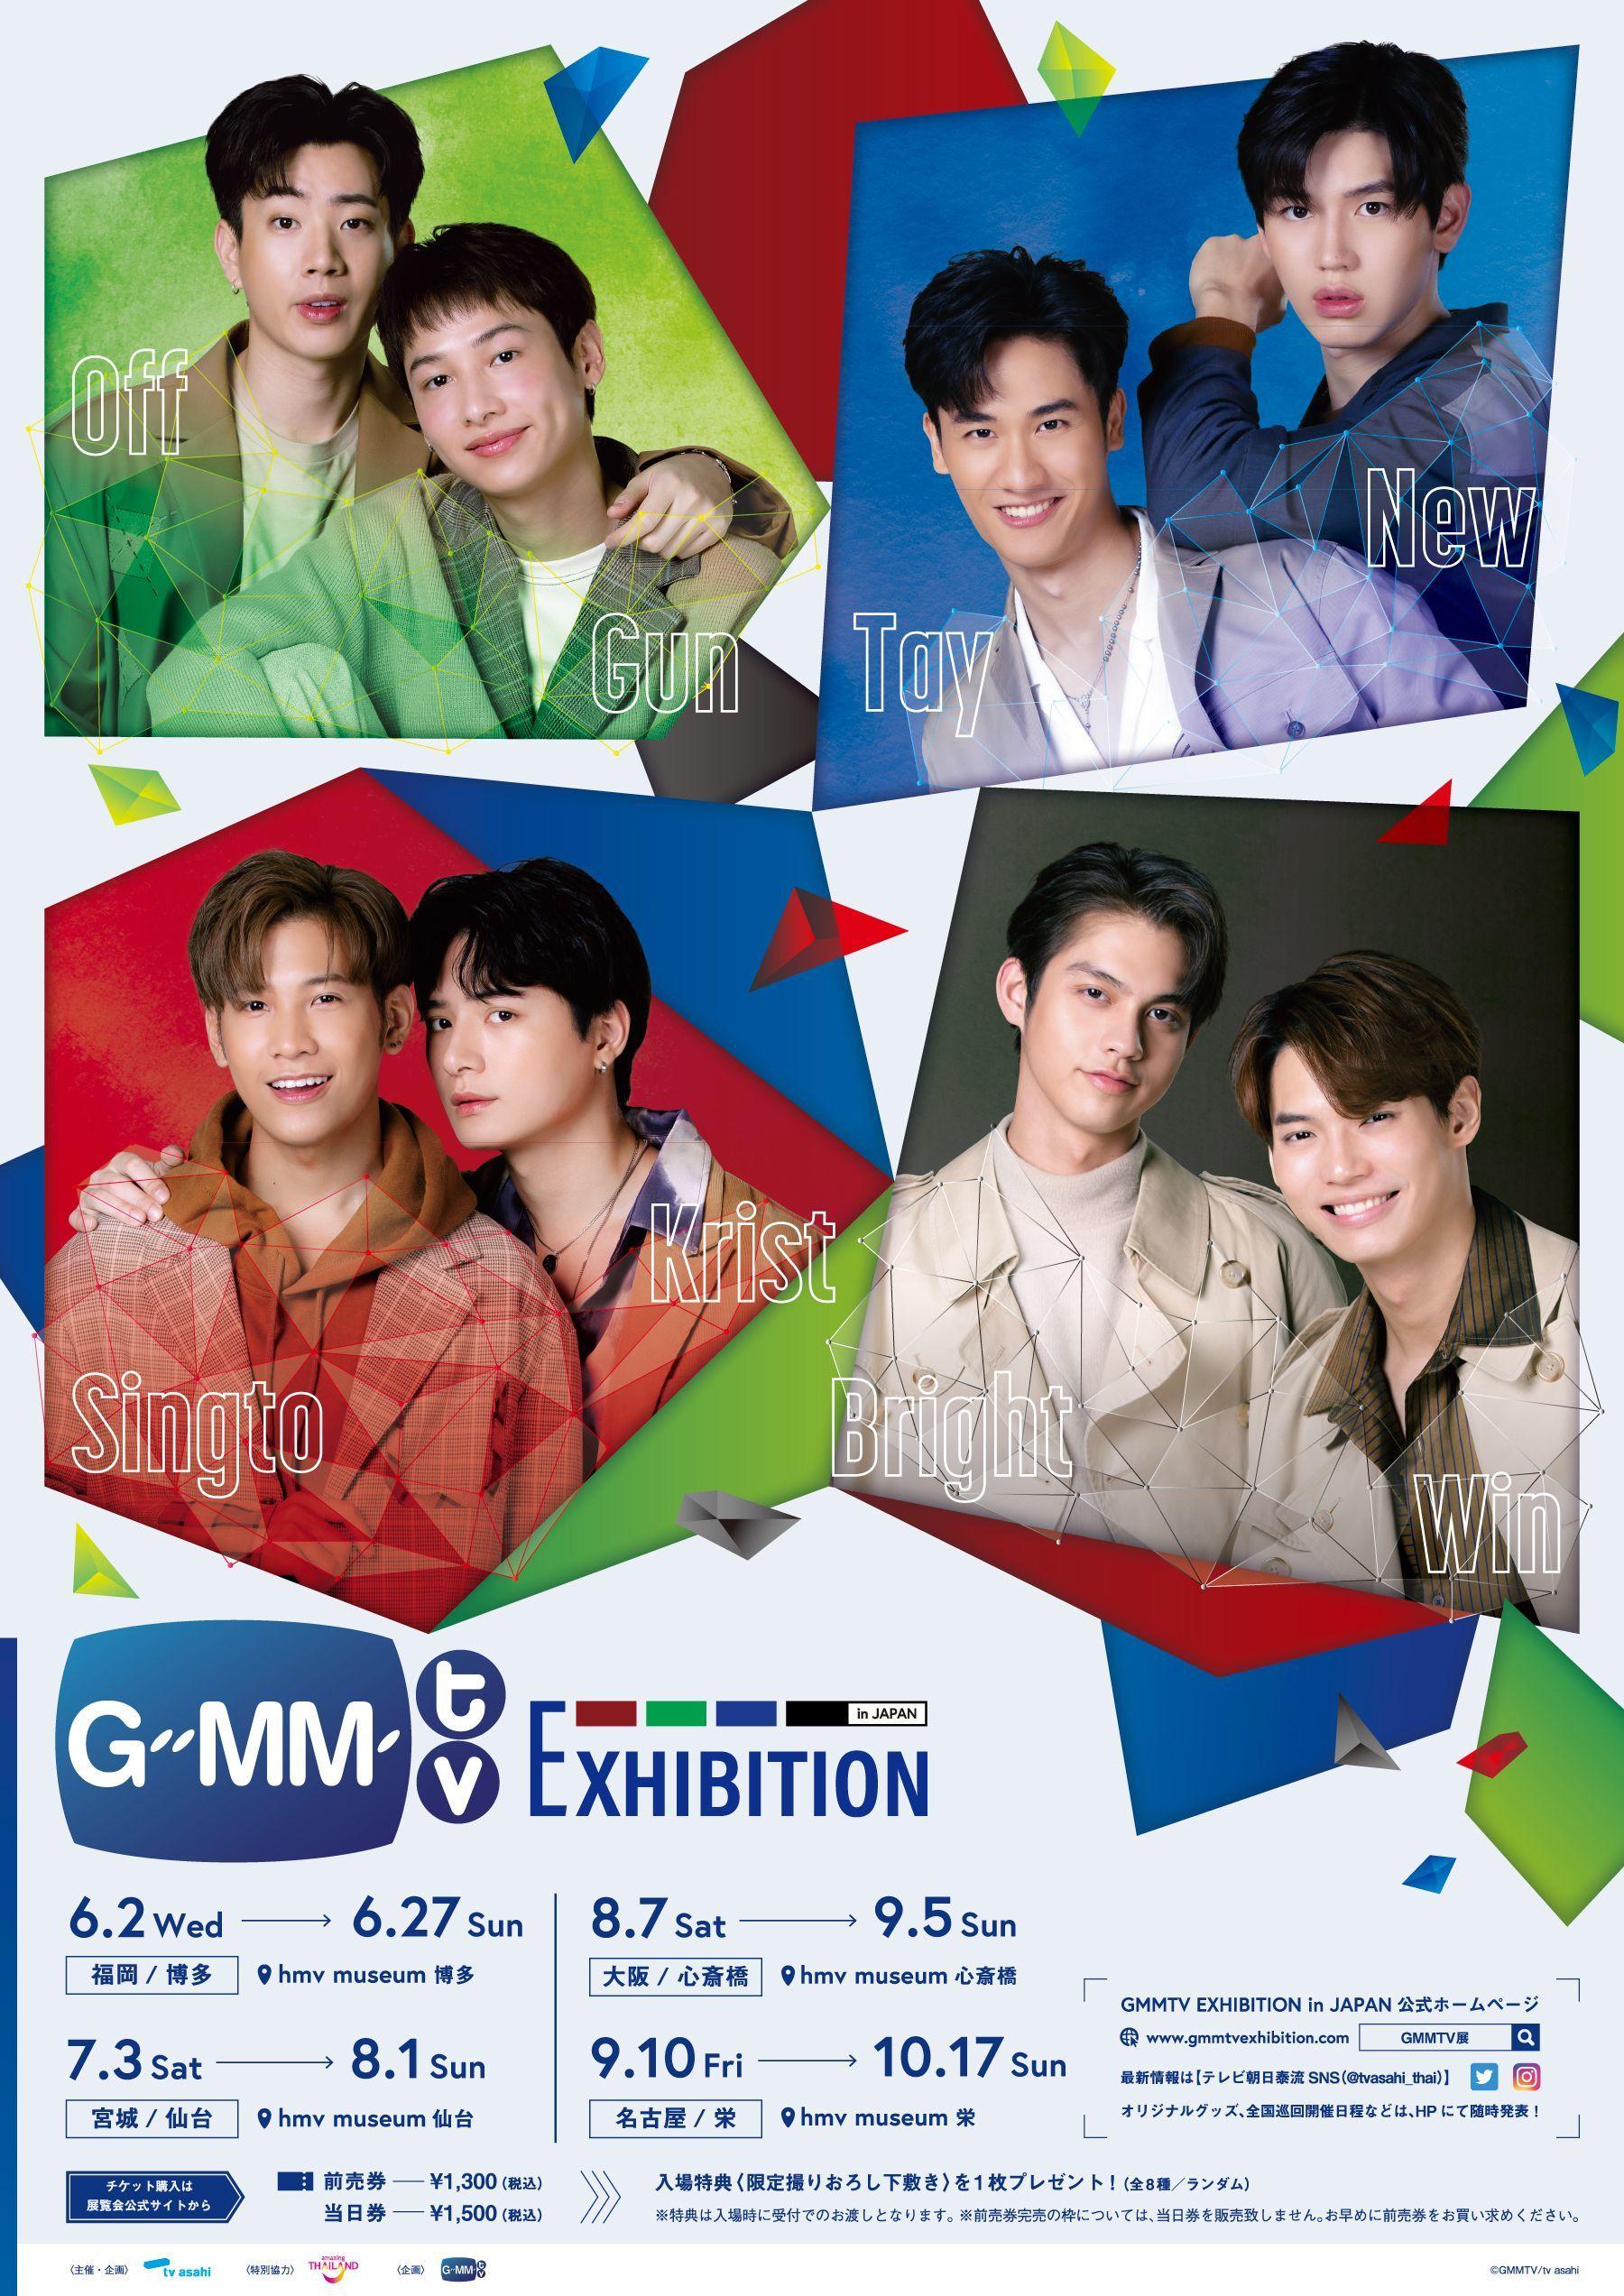 『GMMTV EXHIBITION in JAPAN』 (c)GMMTV/tvasahi